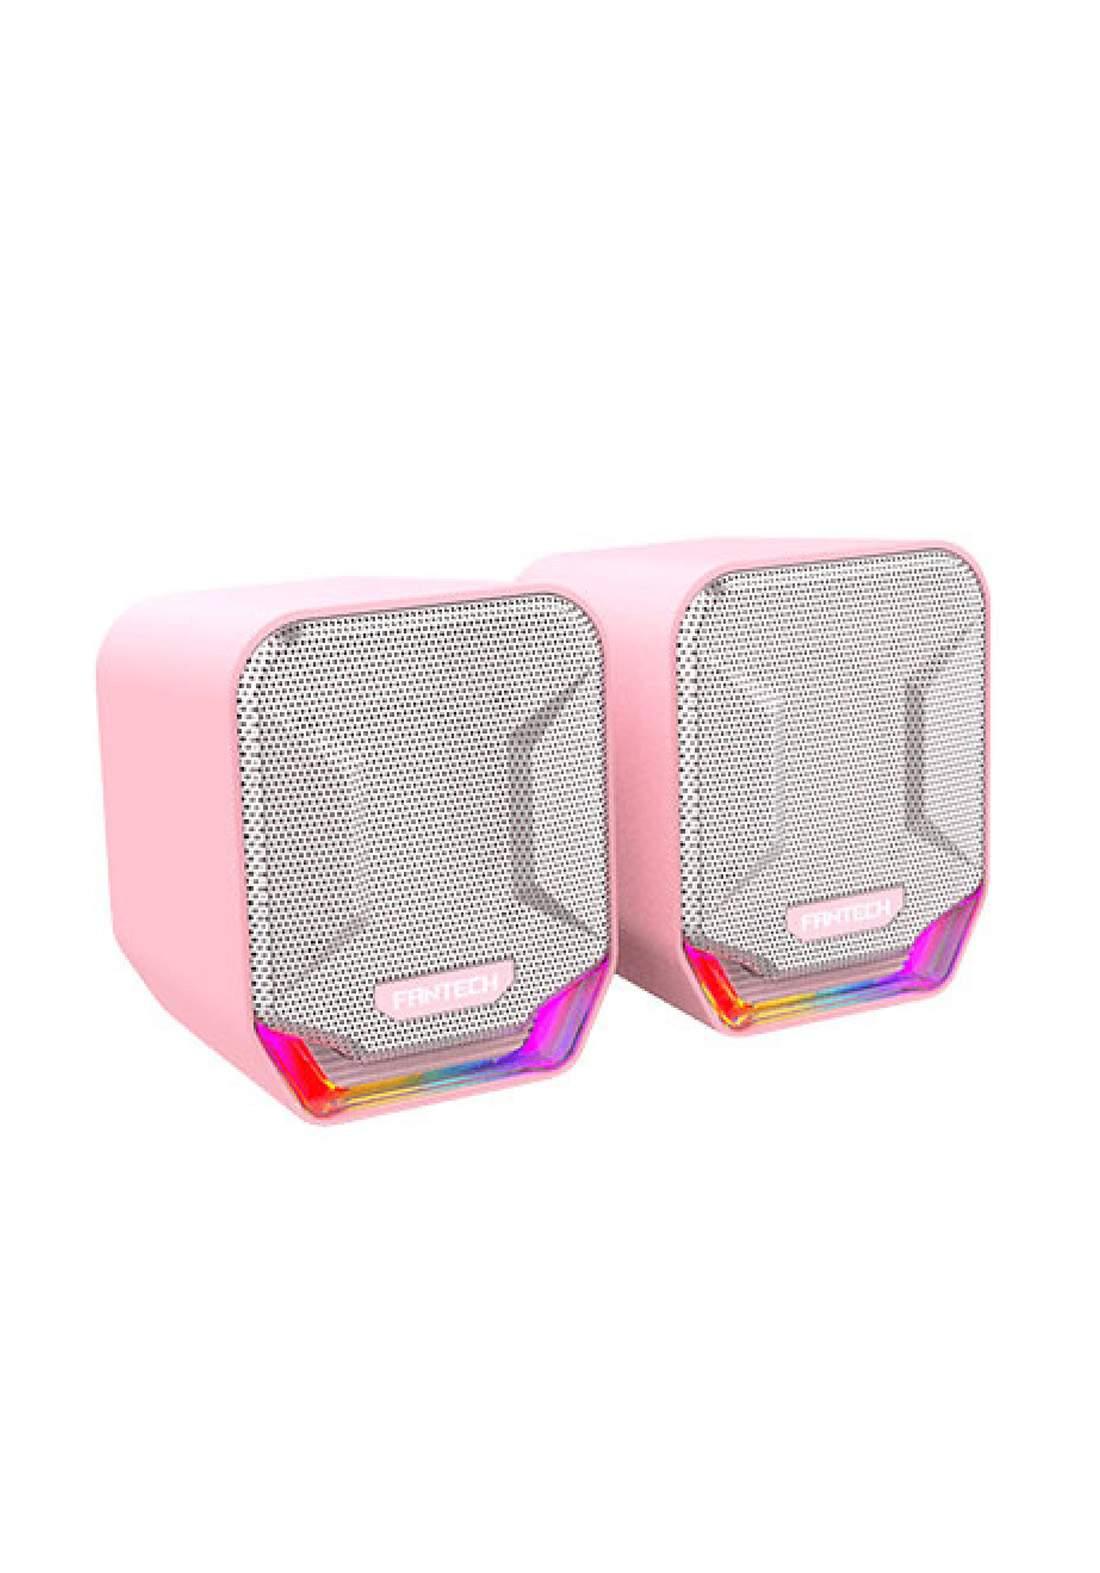 Fantech Sonar Gs202 Sakura LED RGB Edition Speaker - Pink سبيكر